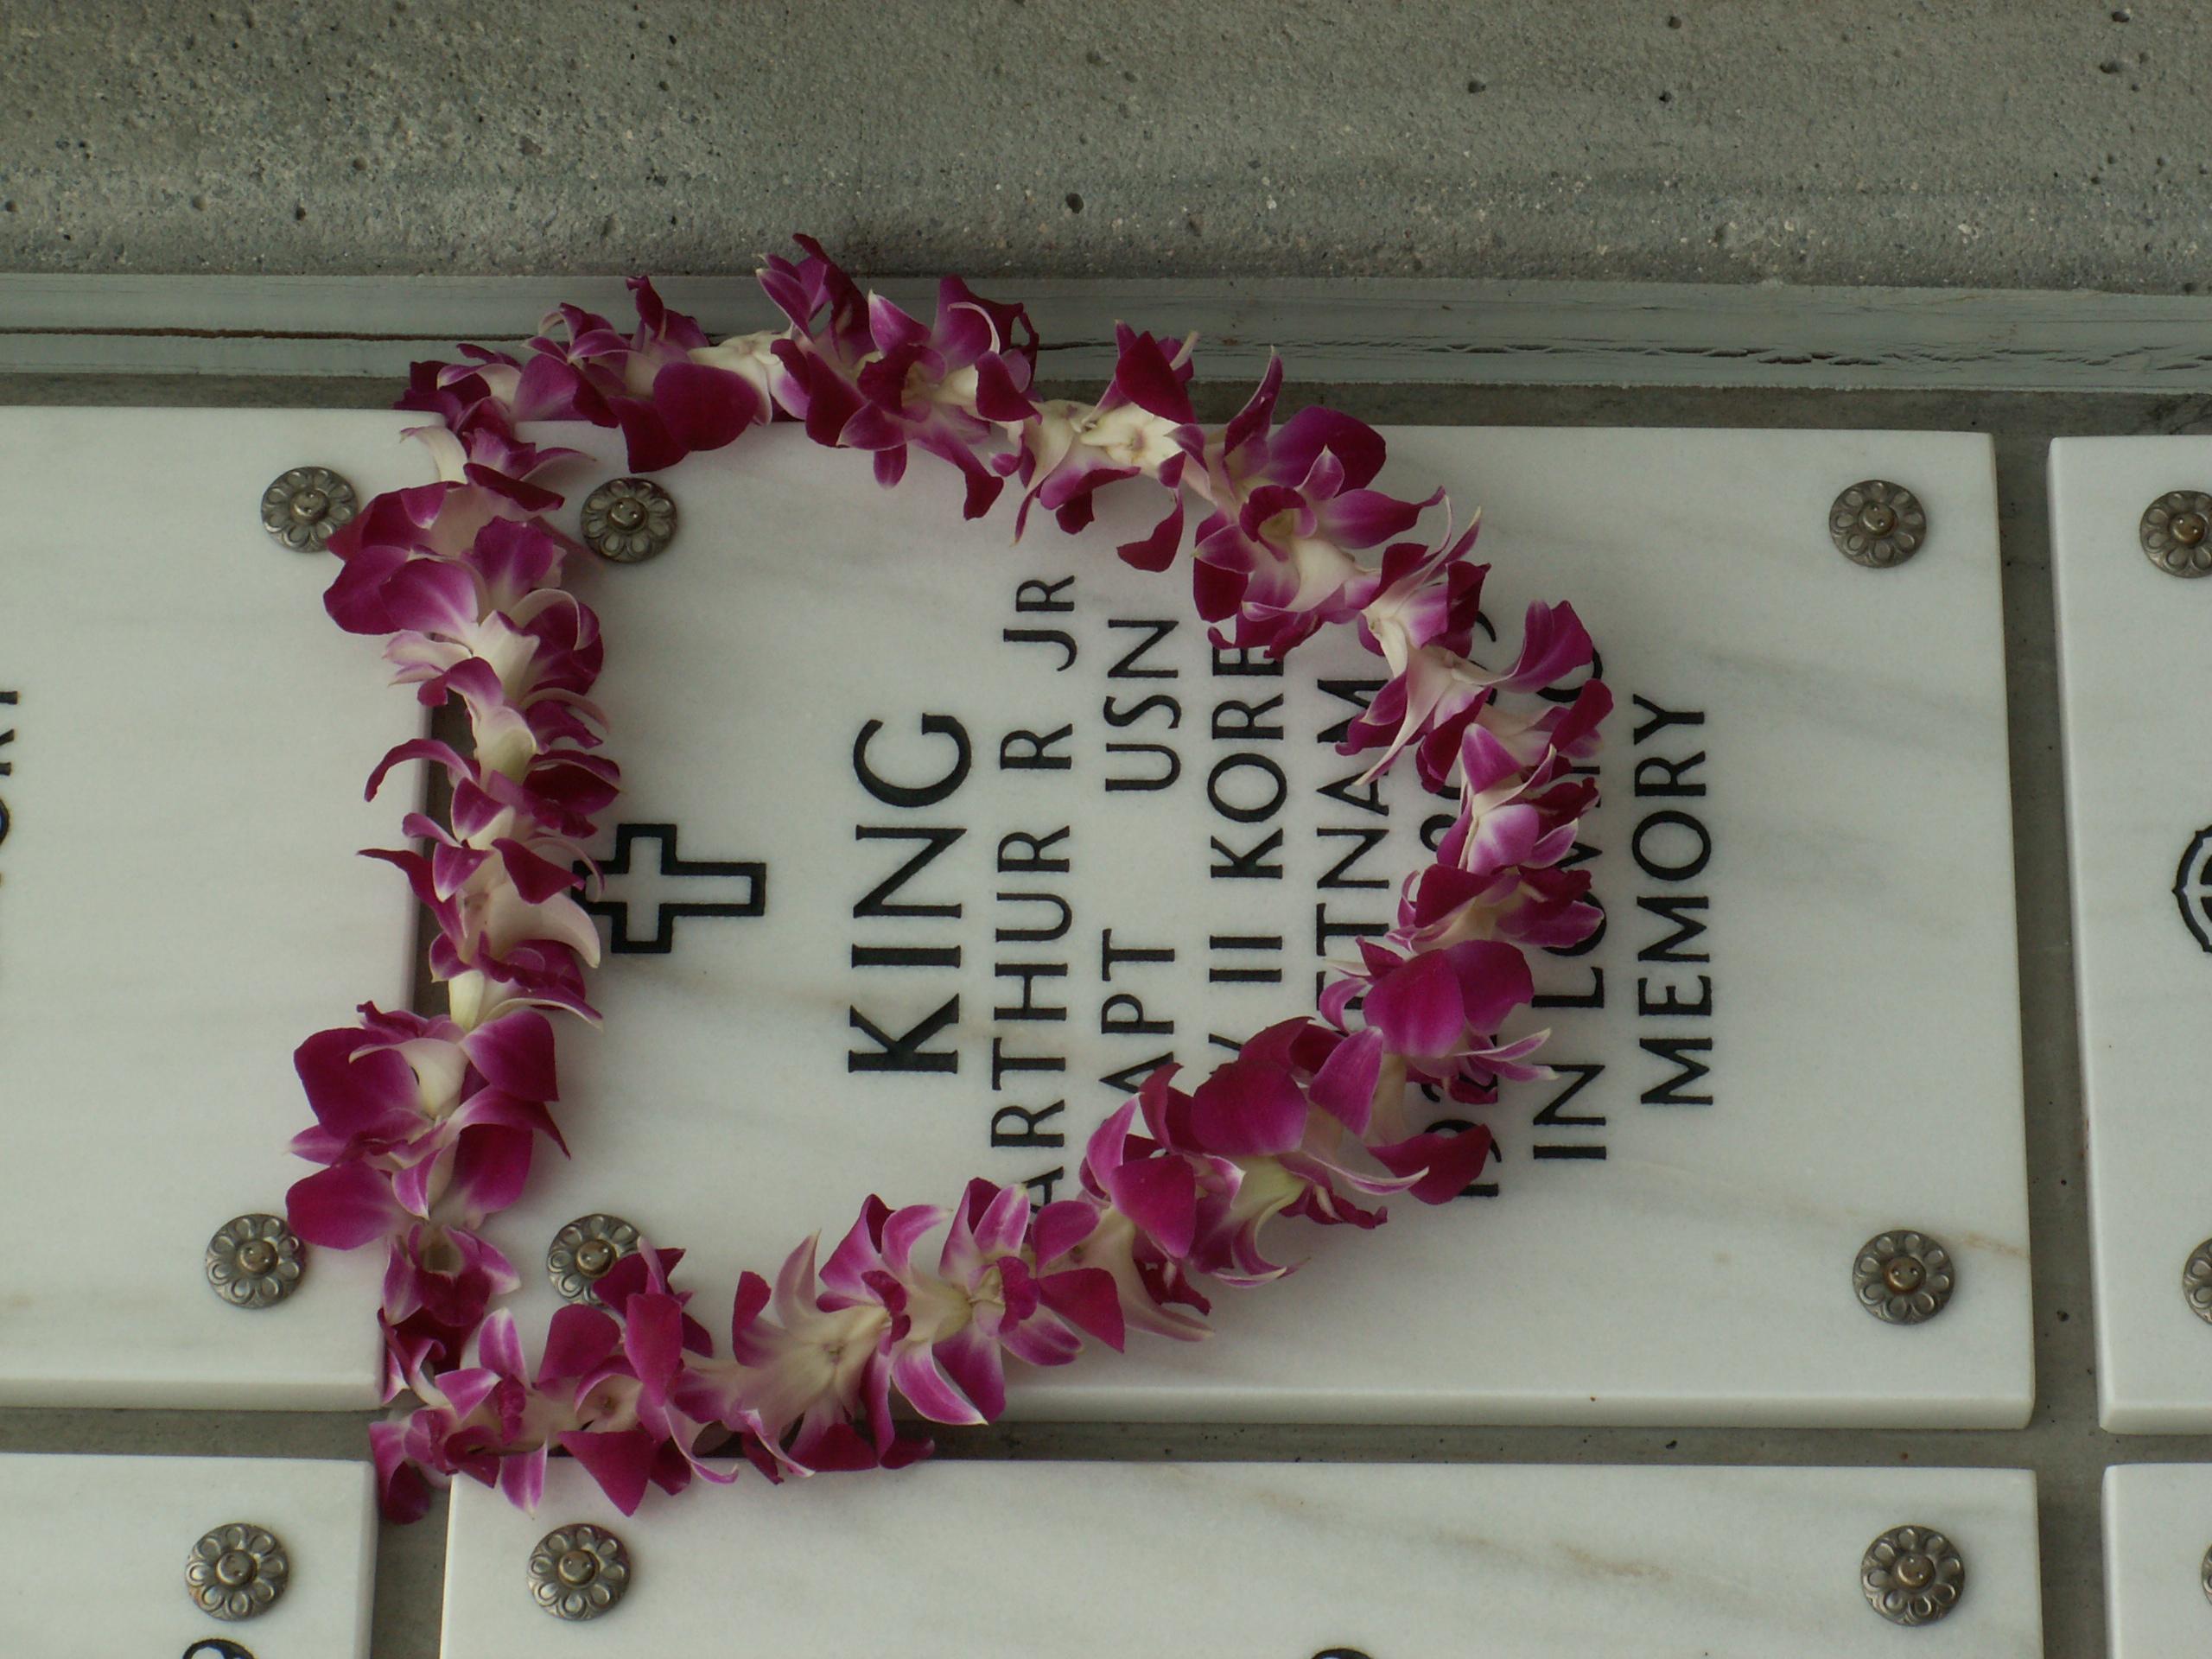 Arthur Richard King